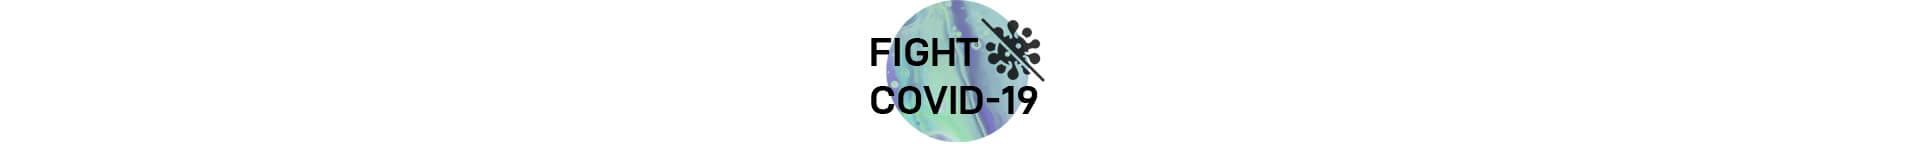 Plataforma FightCOVID-19